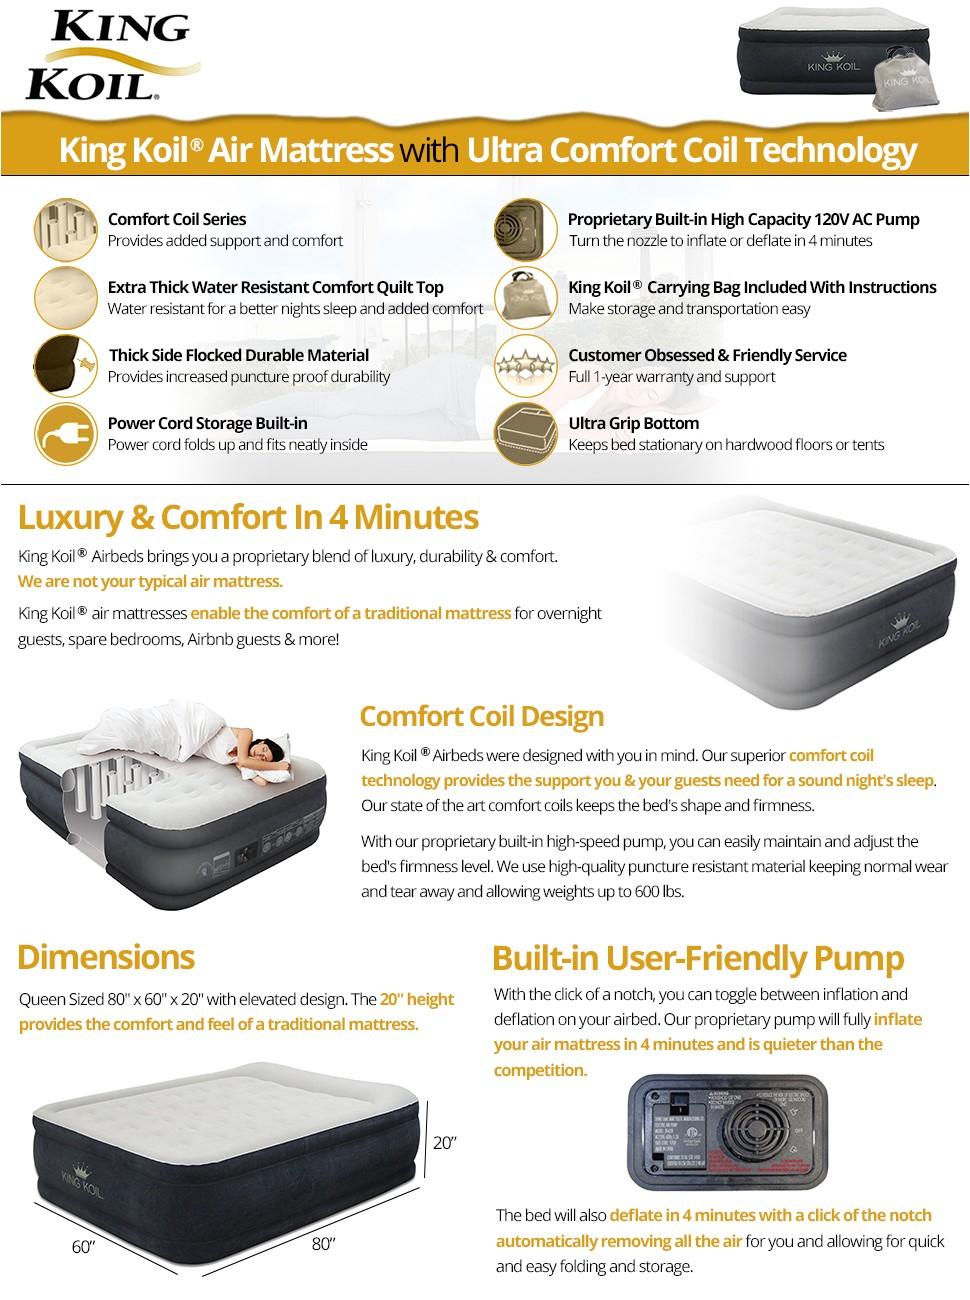 King Koil Air Mattress Reviews Amazon Com King Koil Queen Size Luxury Raised Air